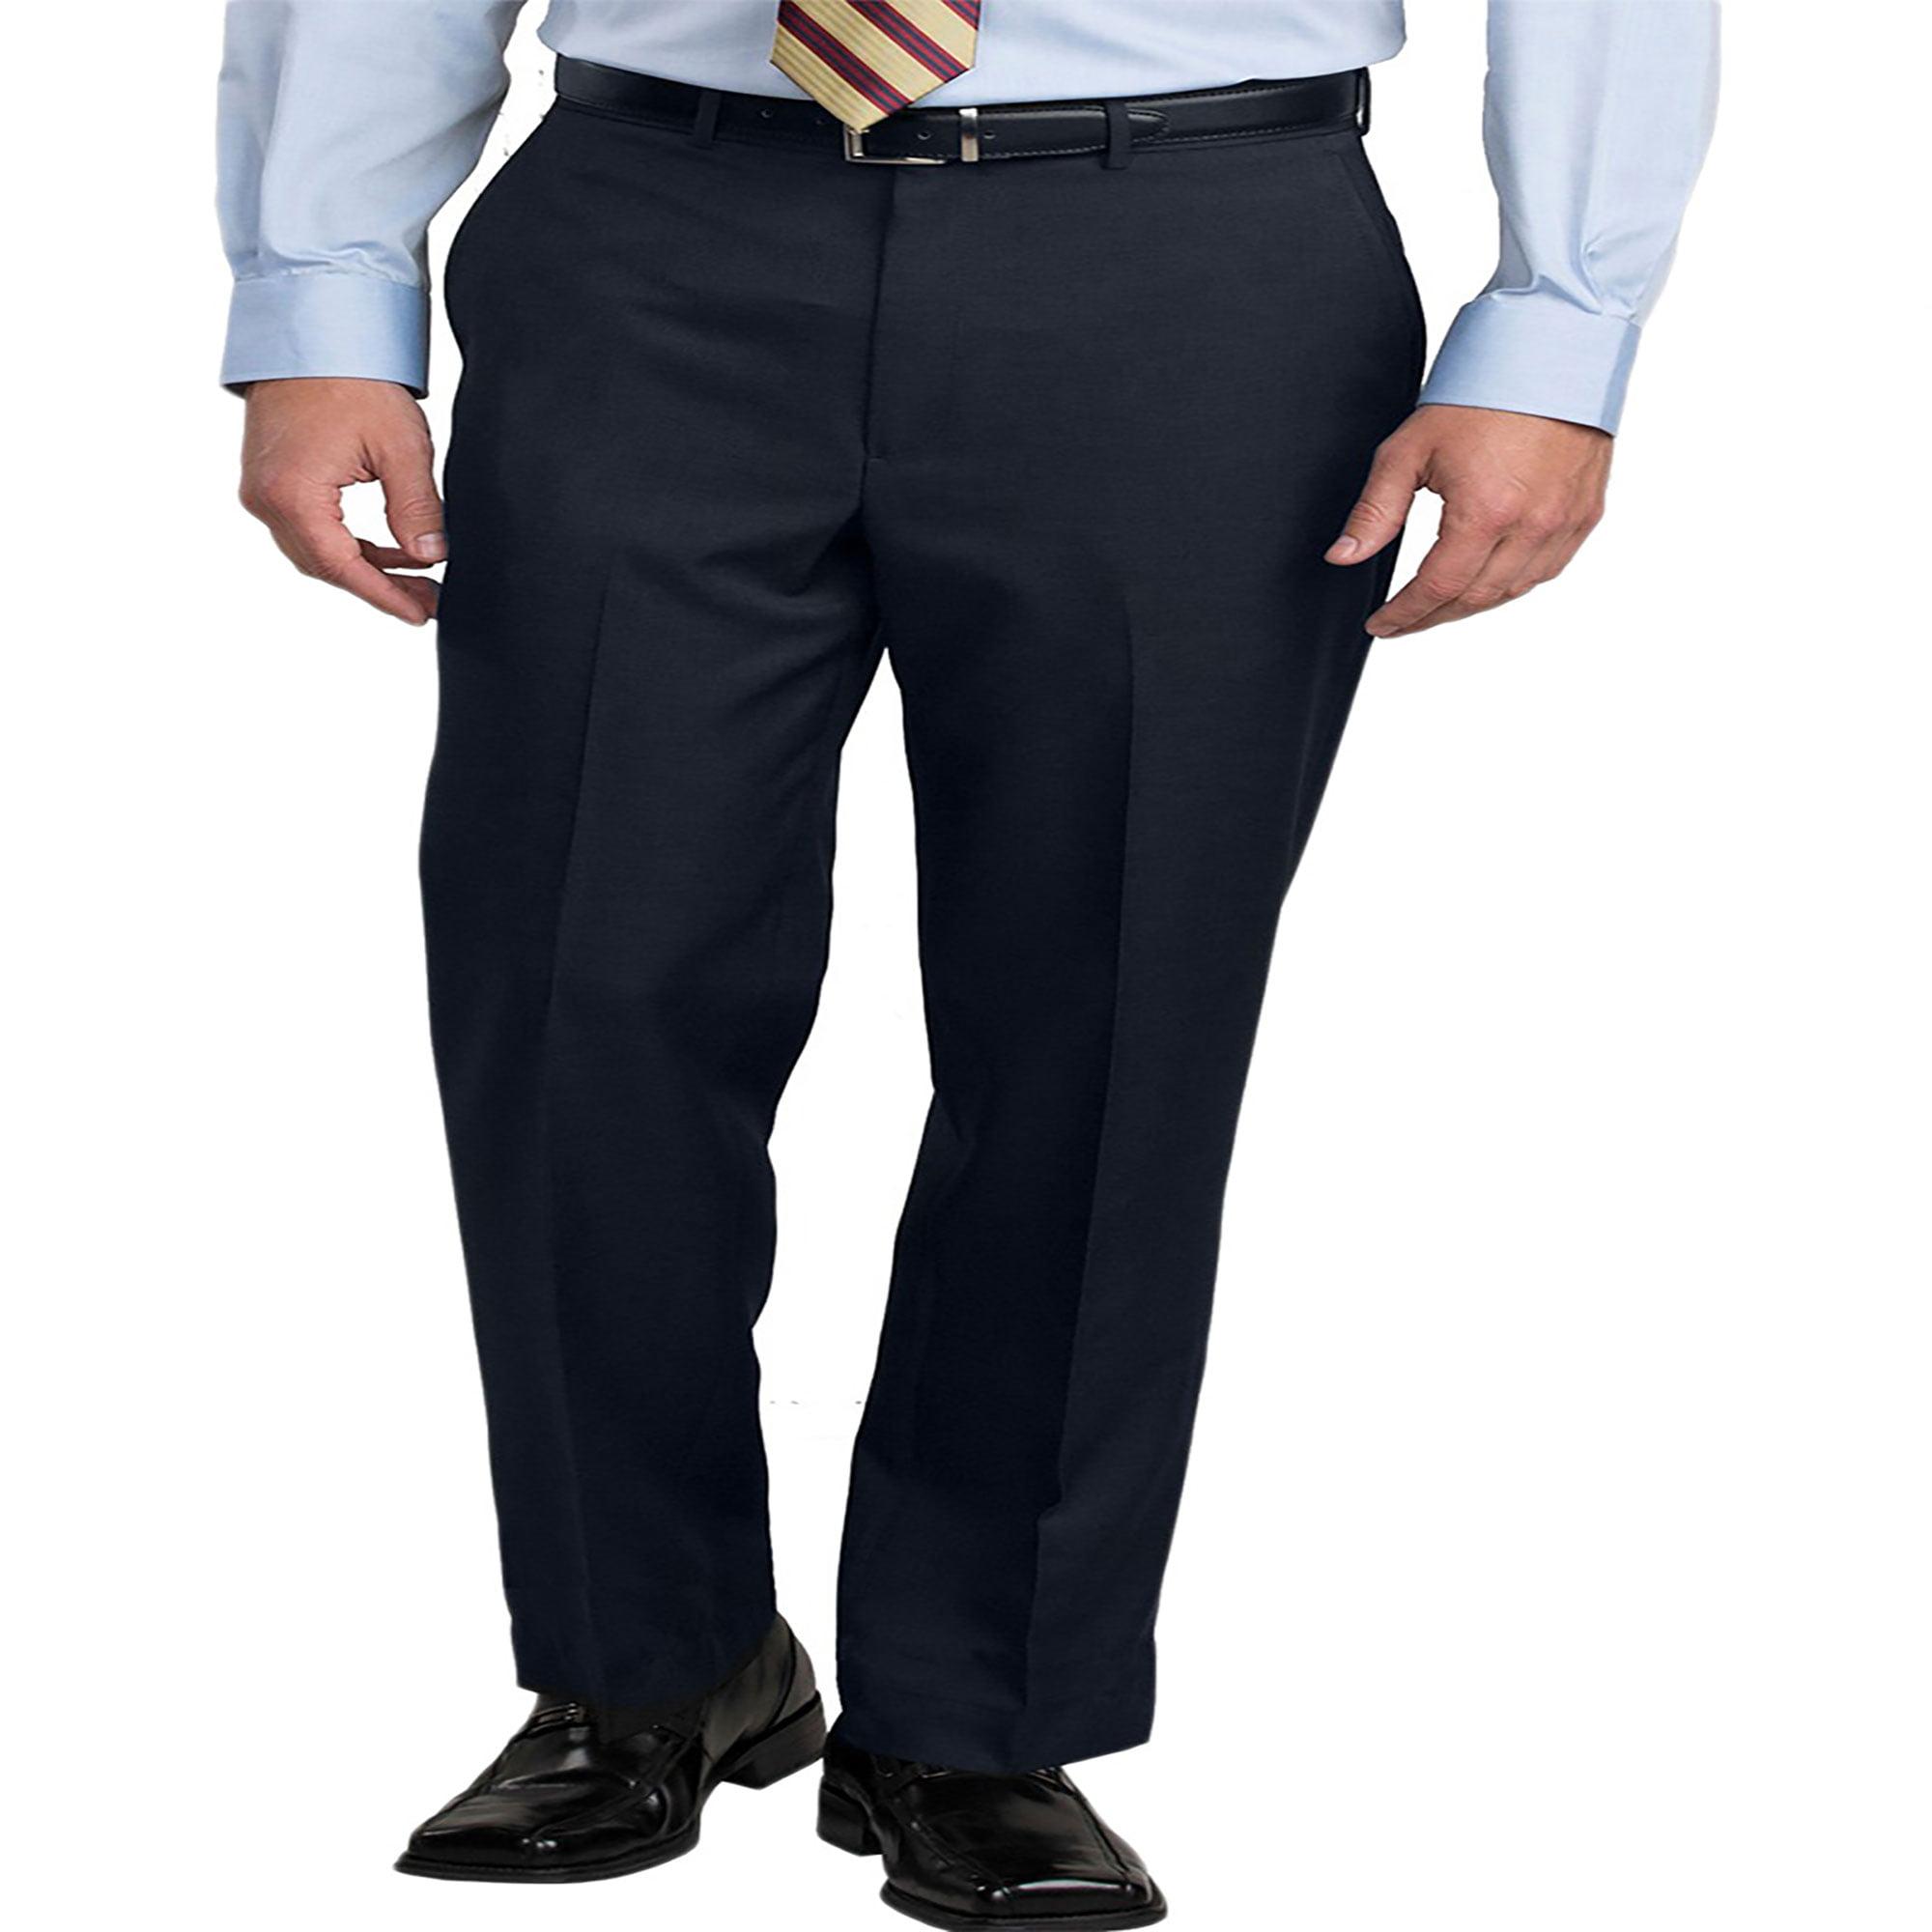 Edwards Garment Men's Washable Dress Pant, Style 2525